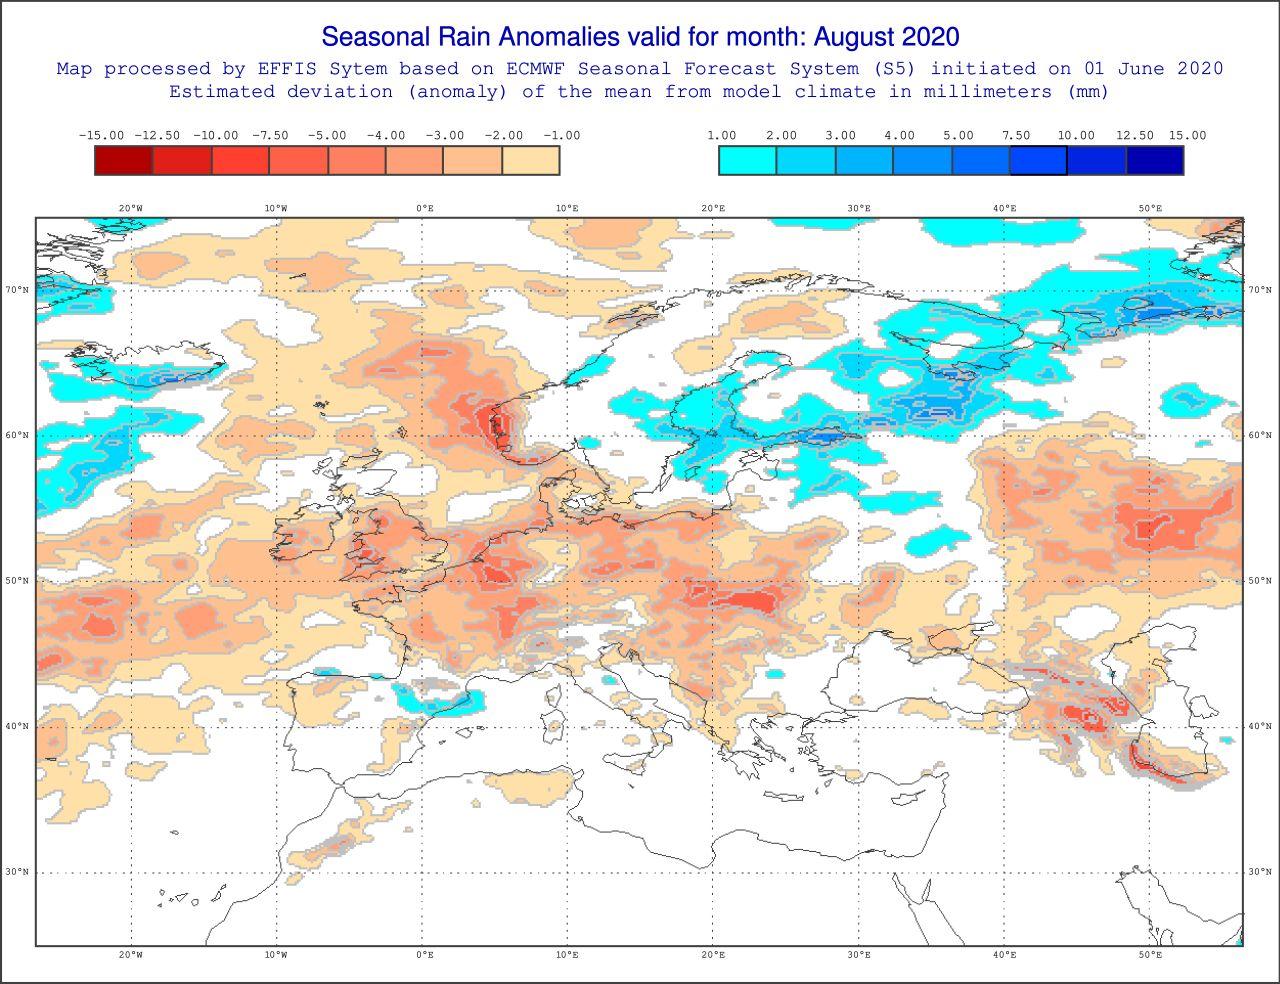 Anomalie pluviometriche Agosto 2020, fonte: effis.jrc.ec.europa.eu.